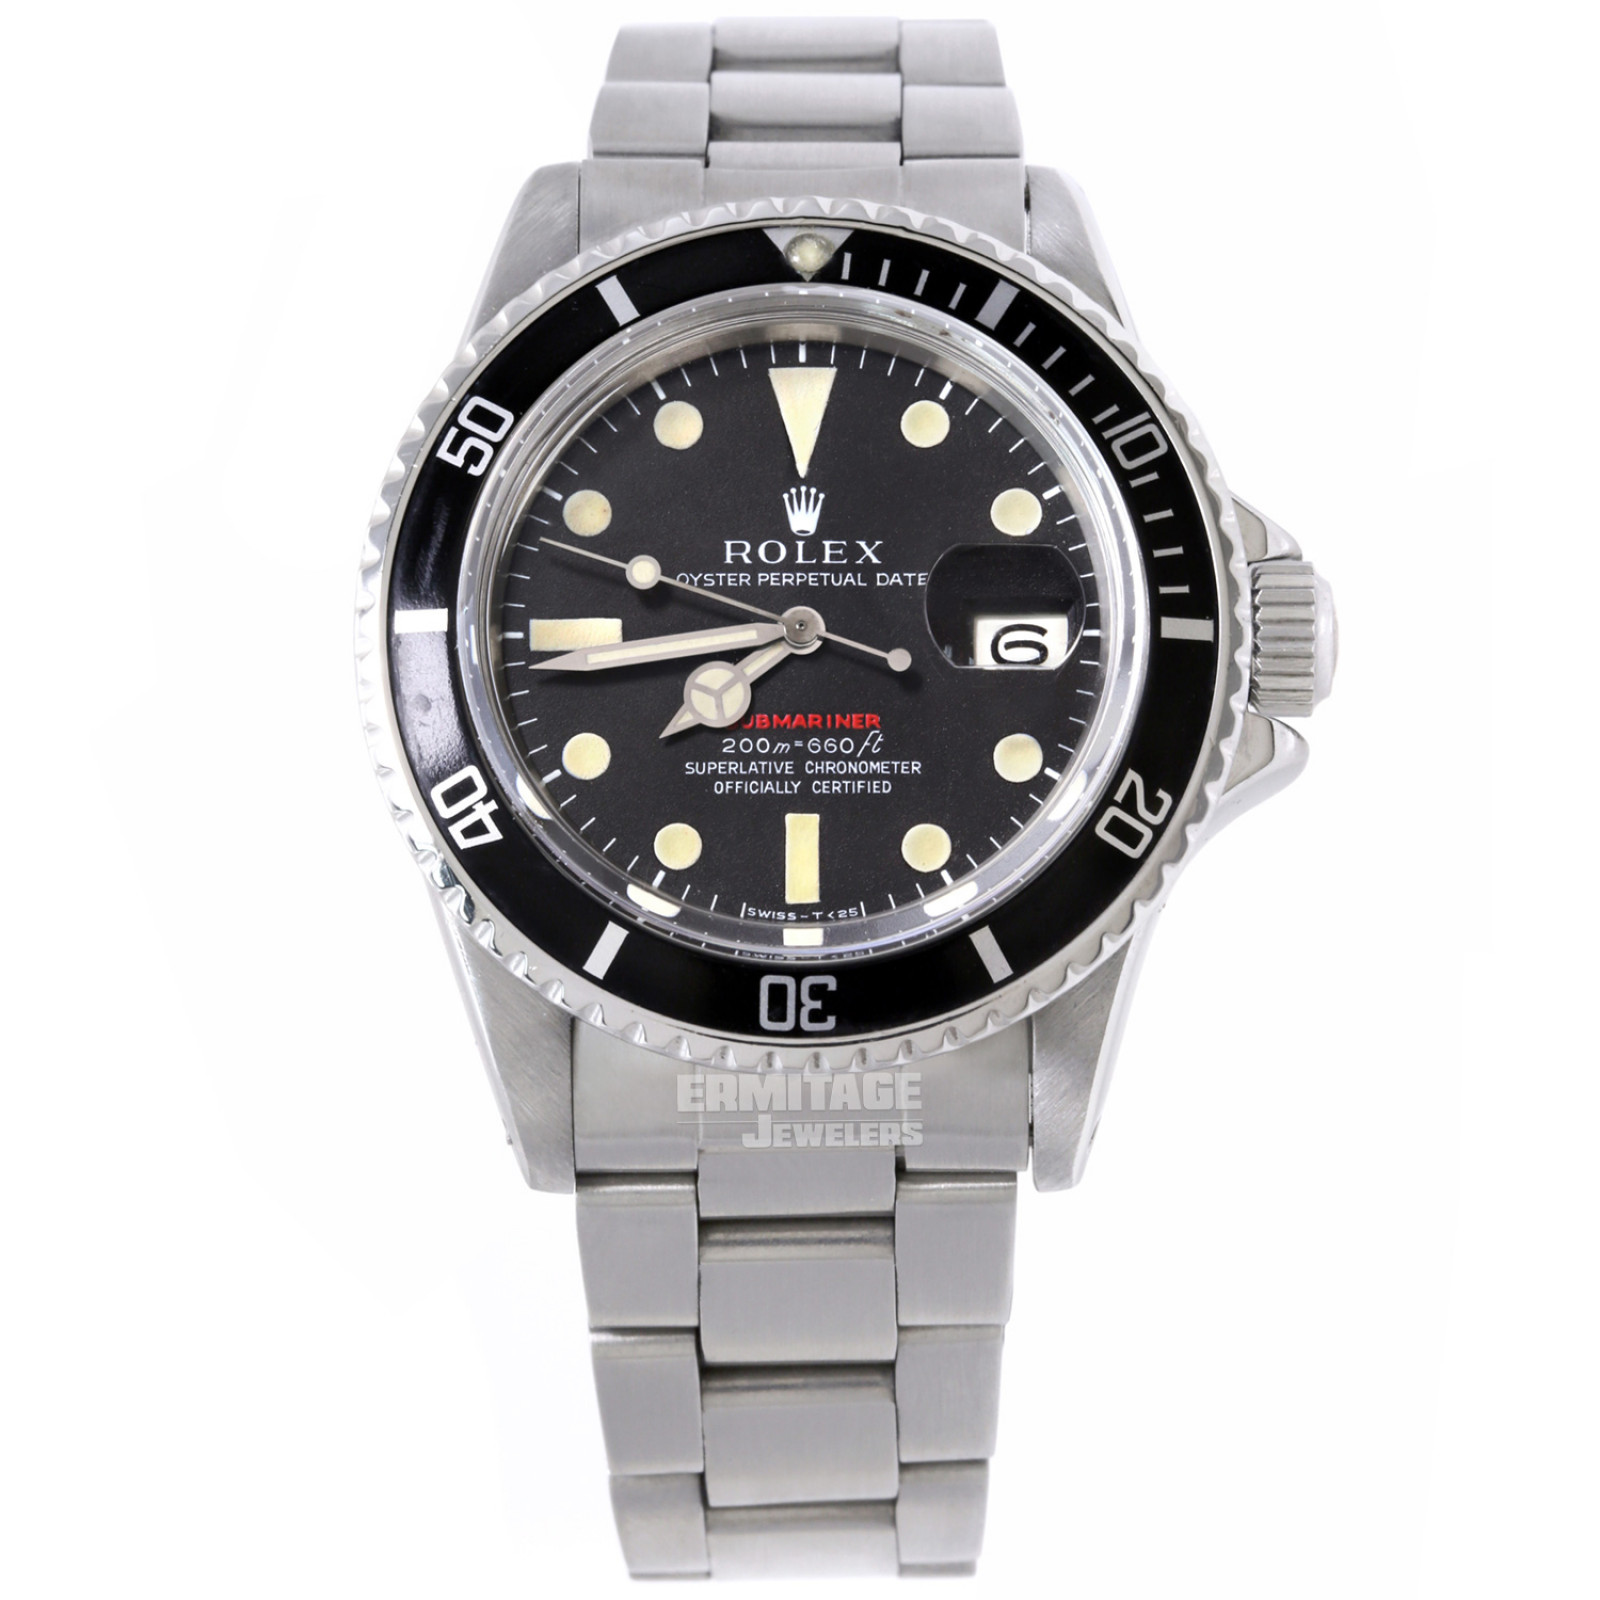 Rolex Submariner 1680 Mark 2